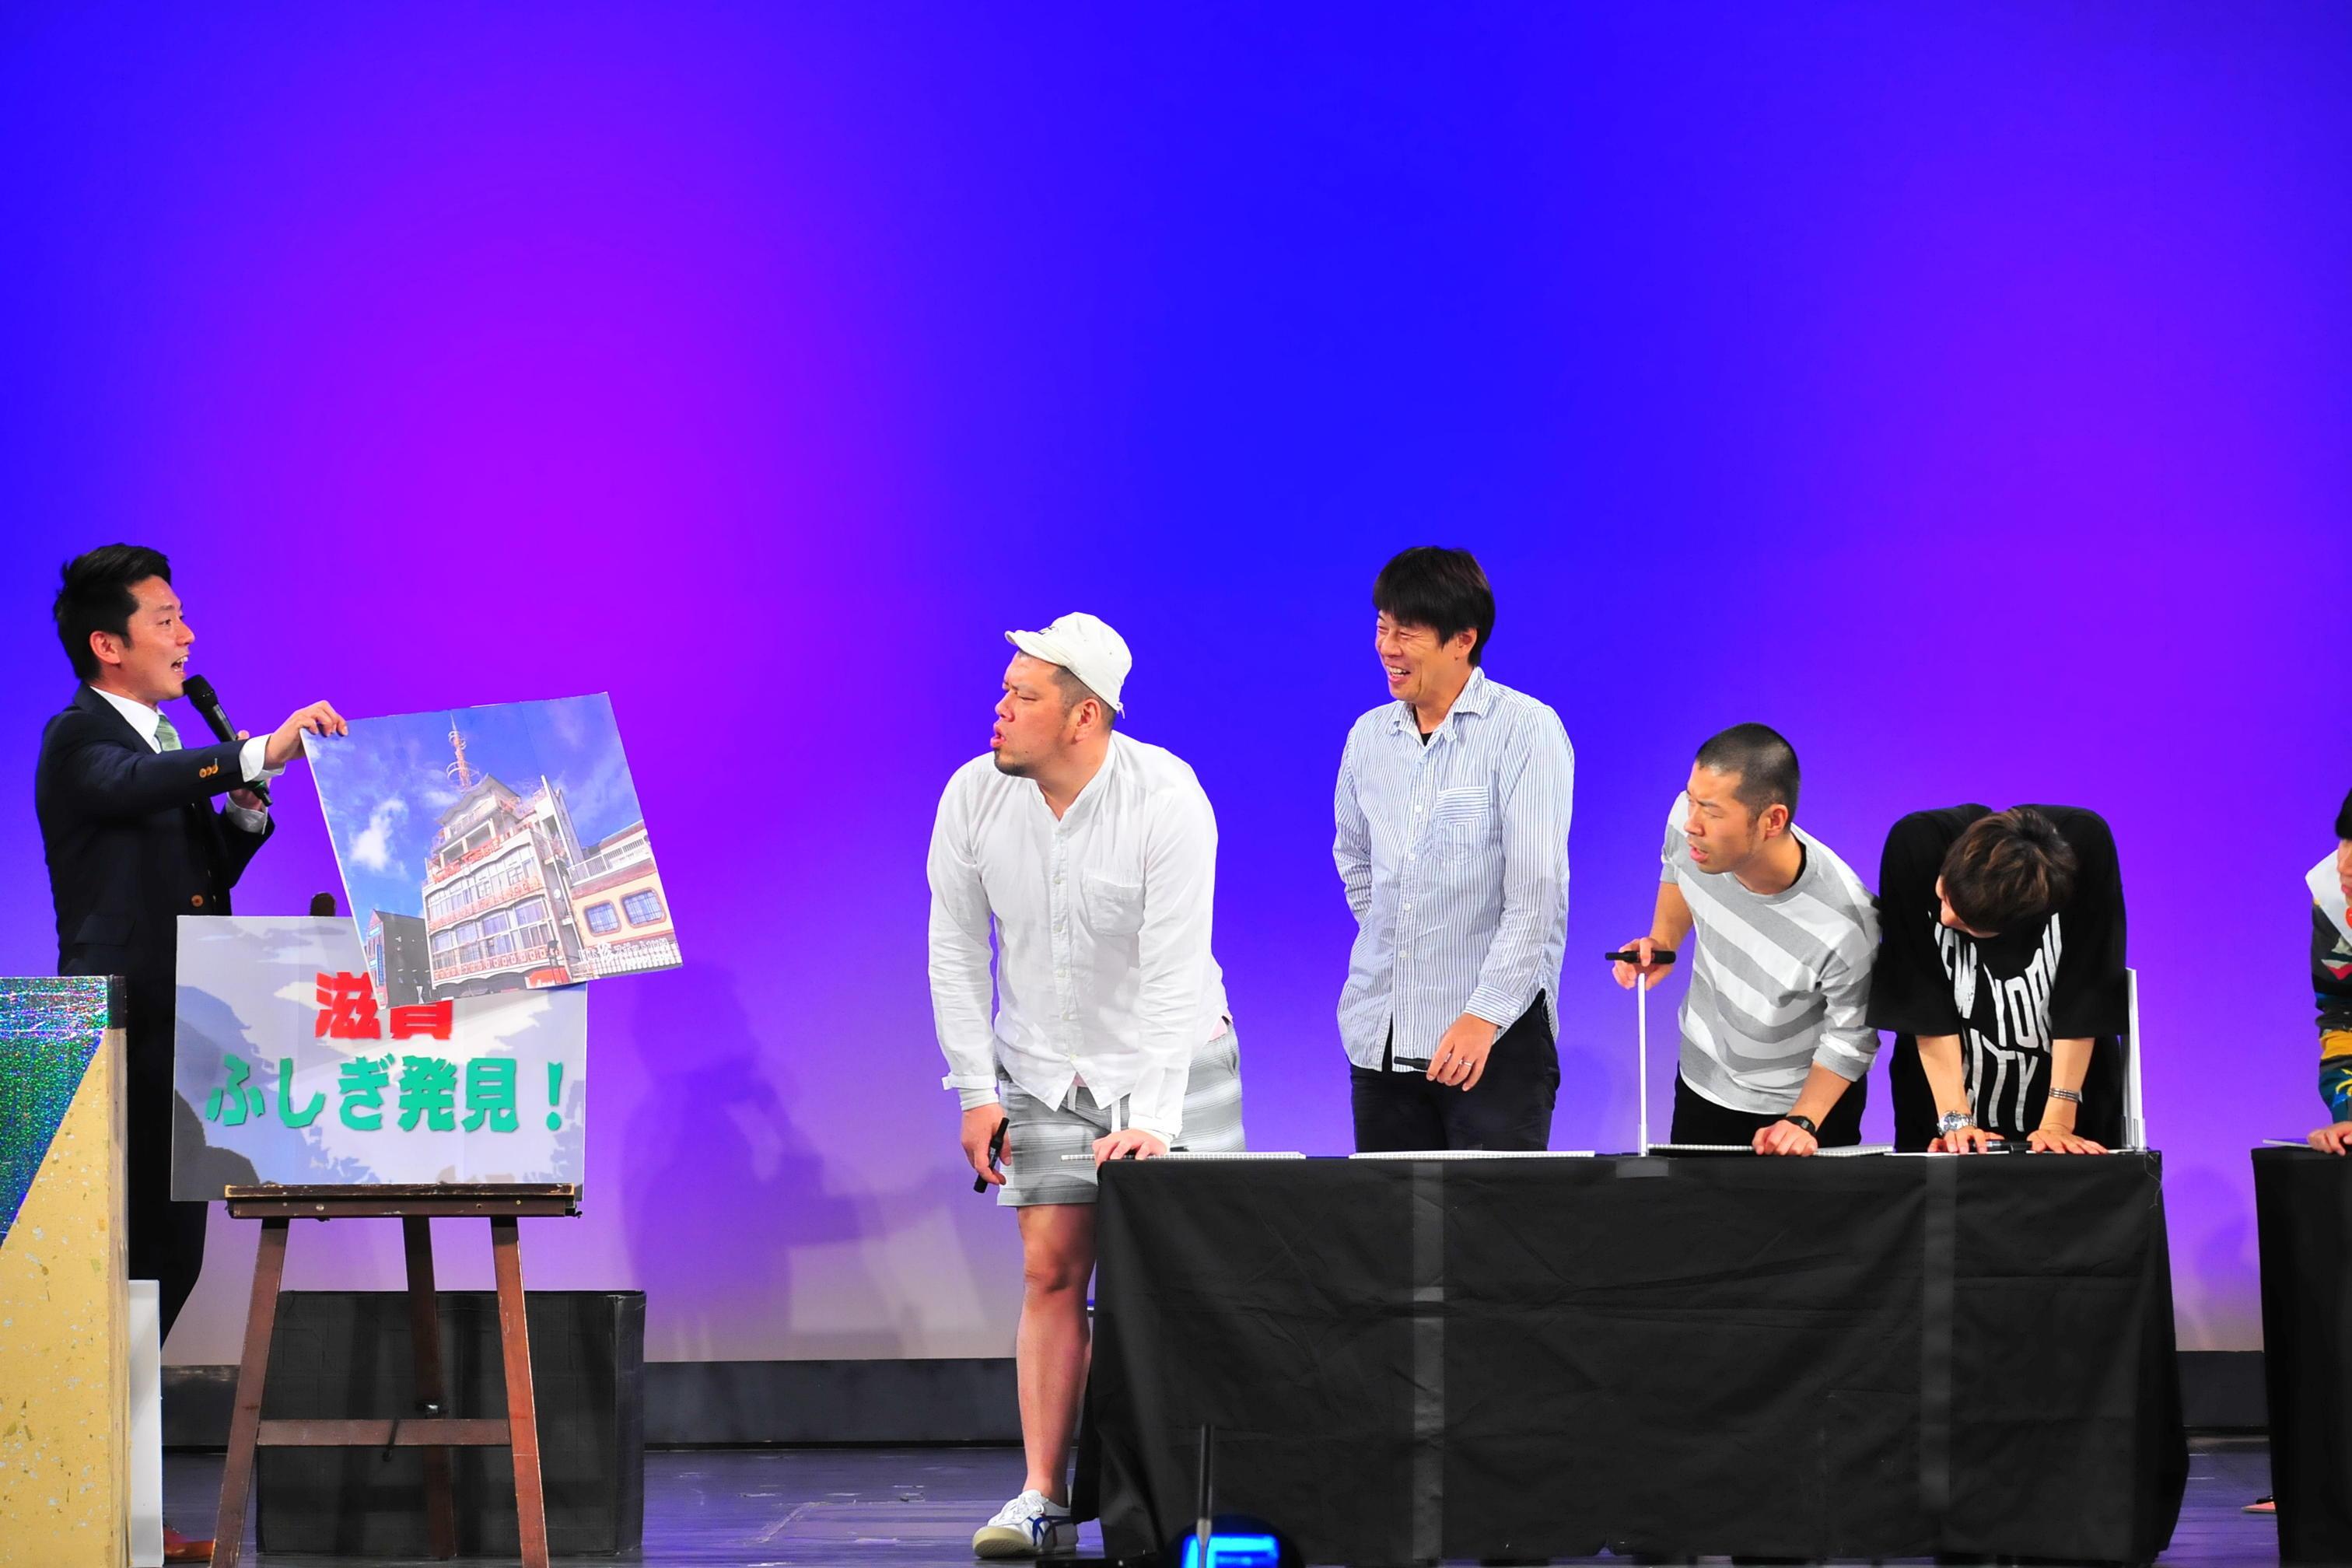 http://news.yoshimoto.co.jp/20160516144430-fc3ac70f77fb6c221ccaad7abed2bdef4ff5dab6.jpg